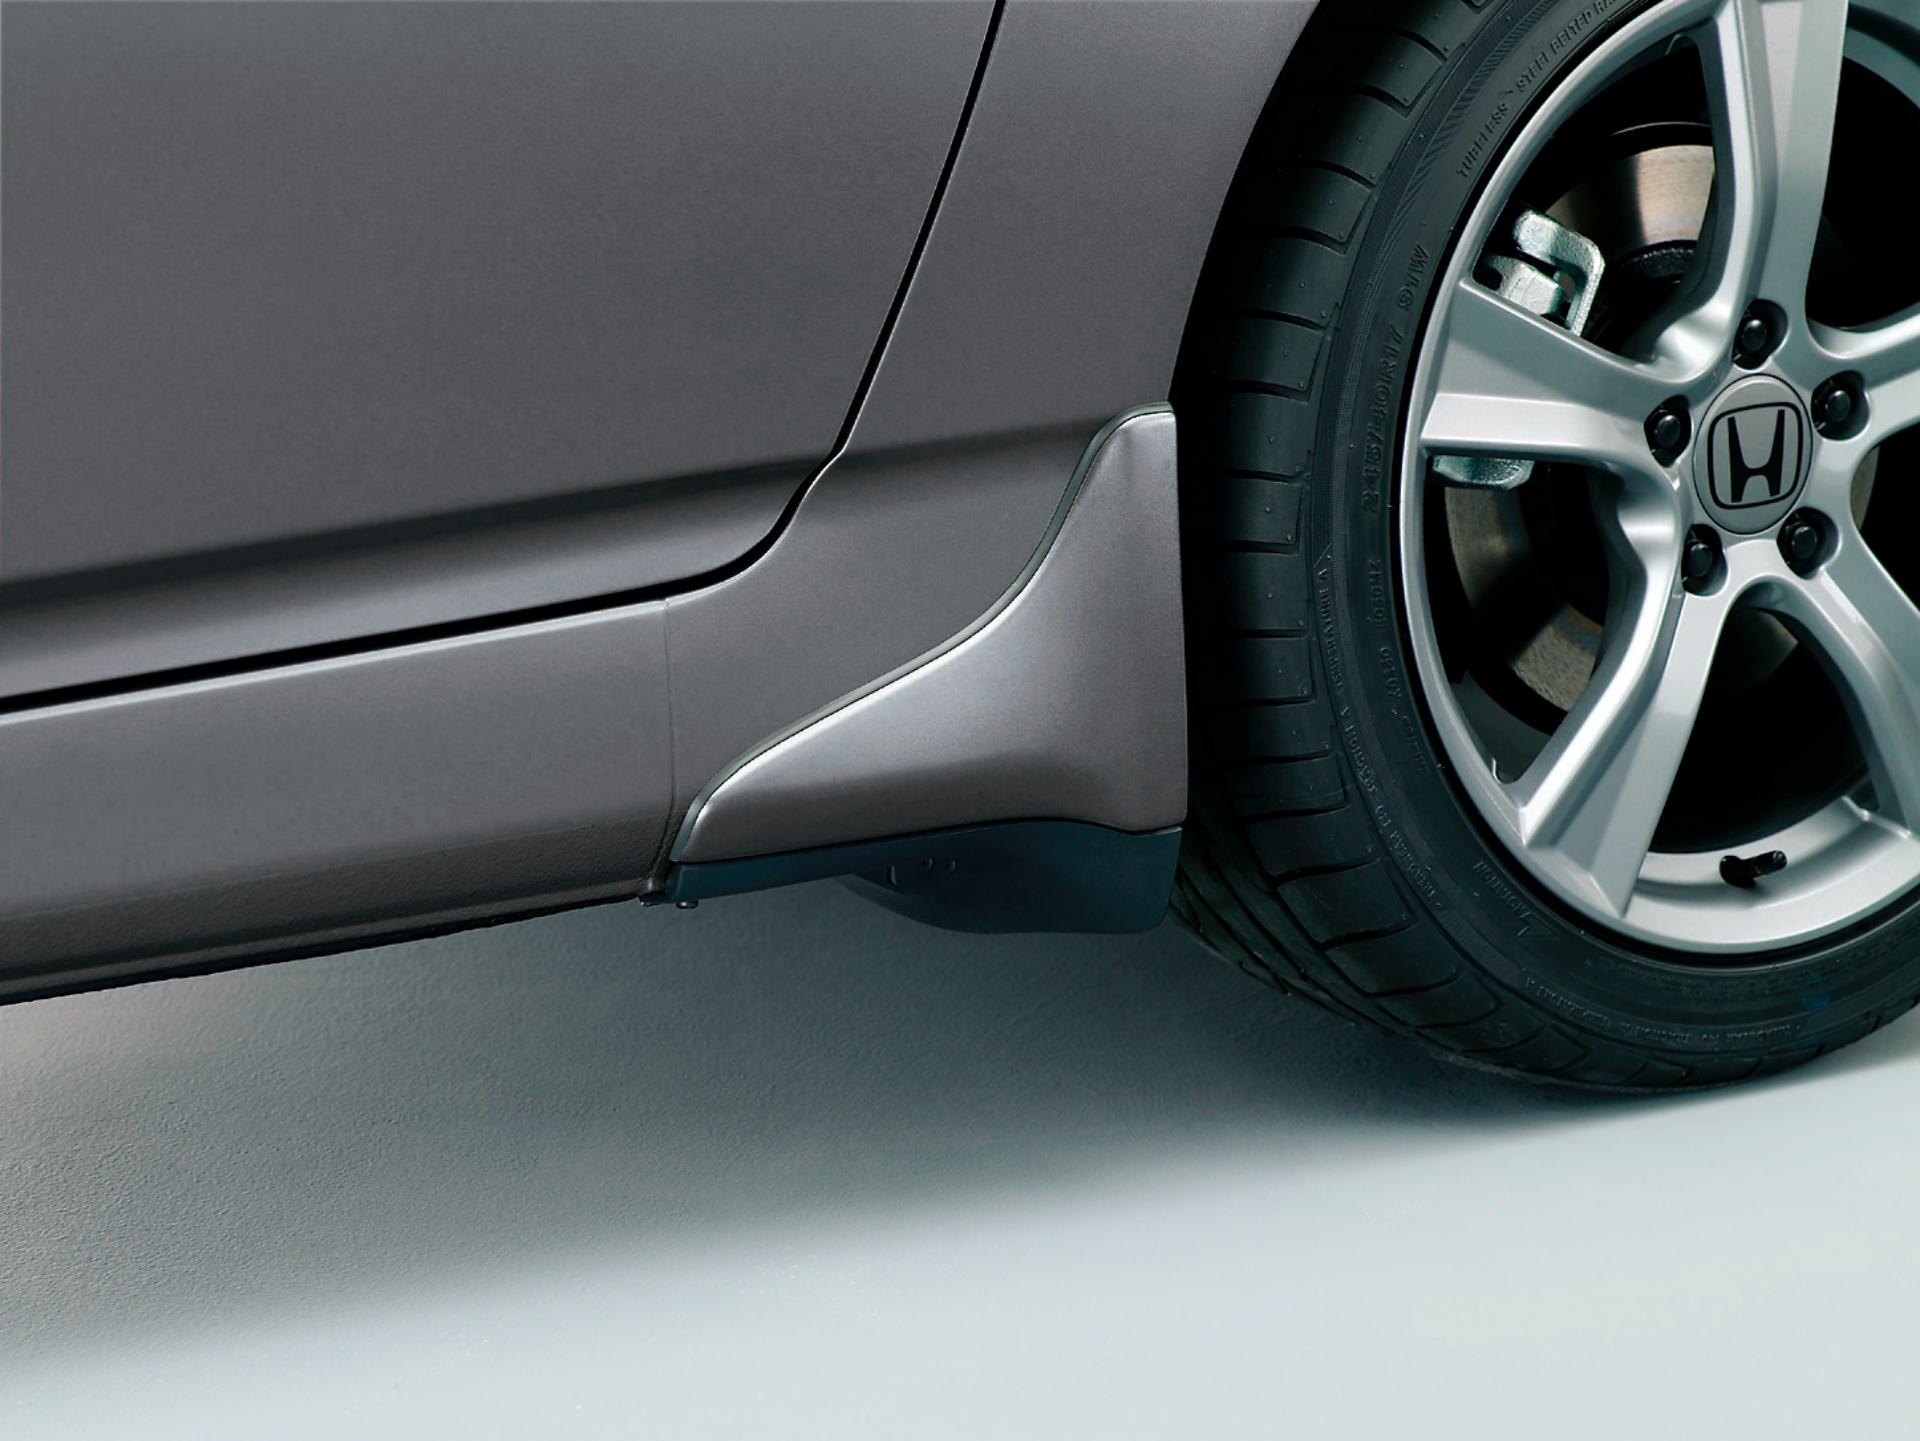 Honda-S2000-20th-Anniversary-genuine-accessories-12